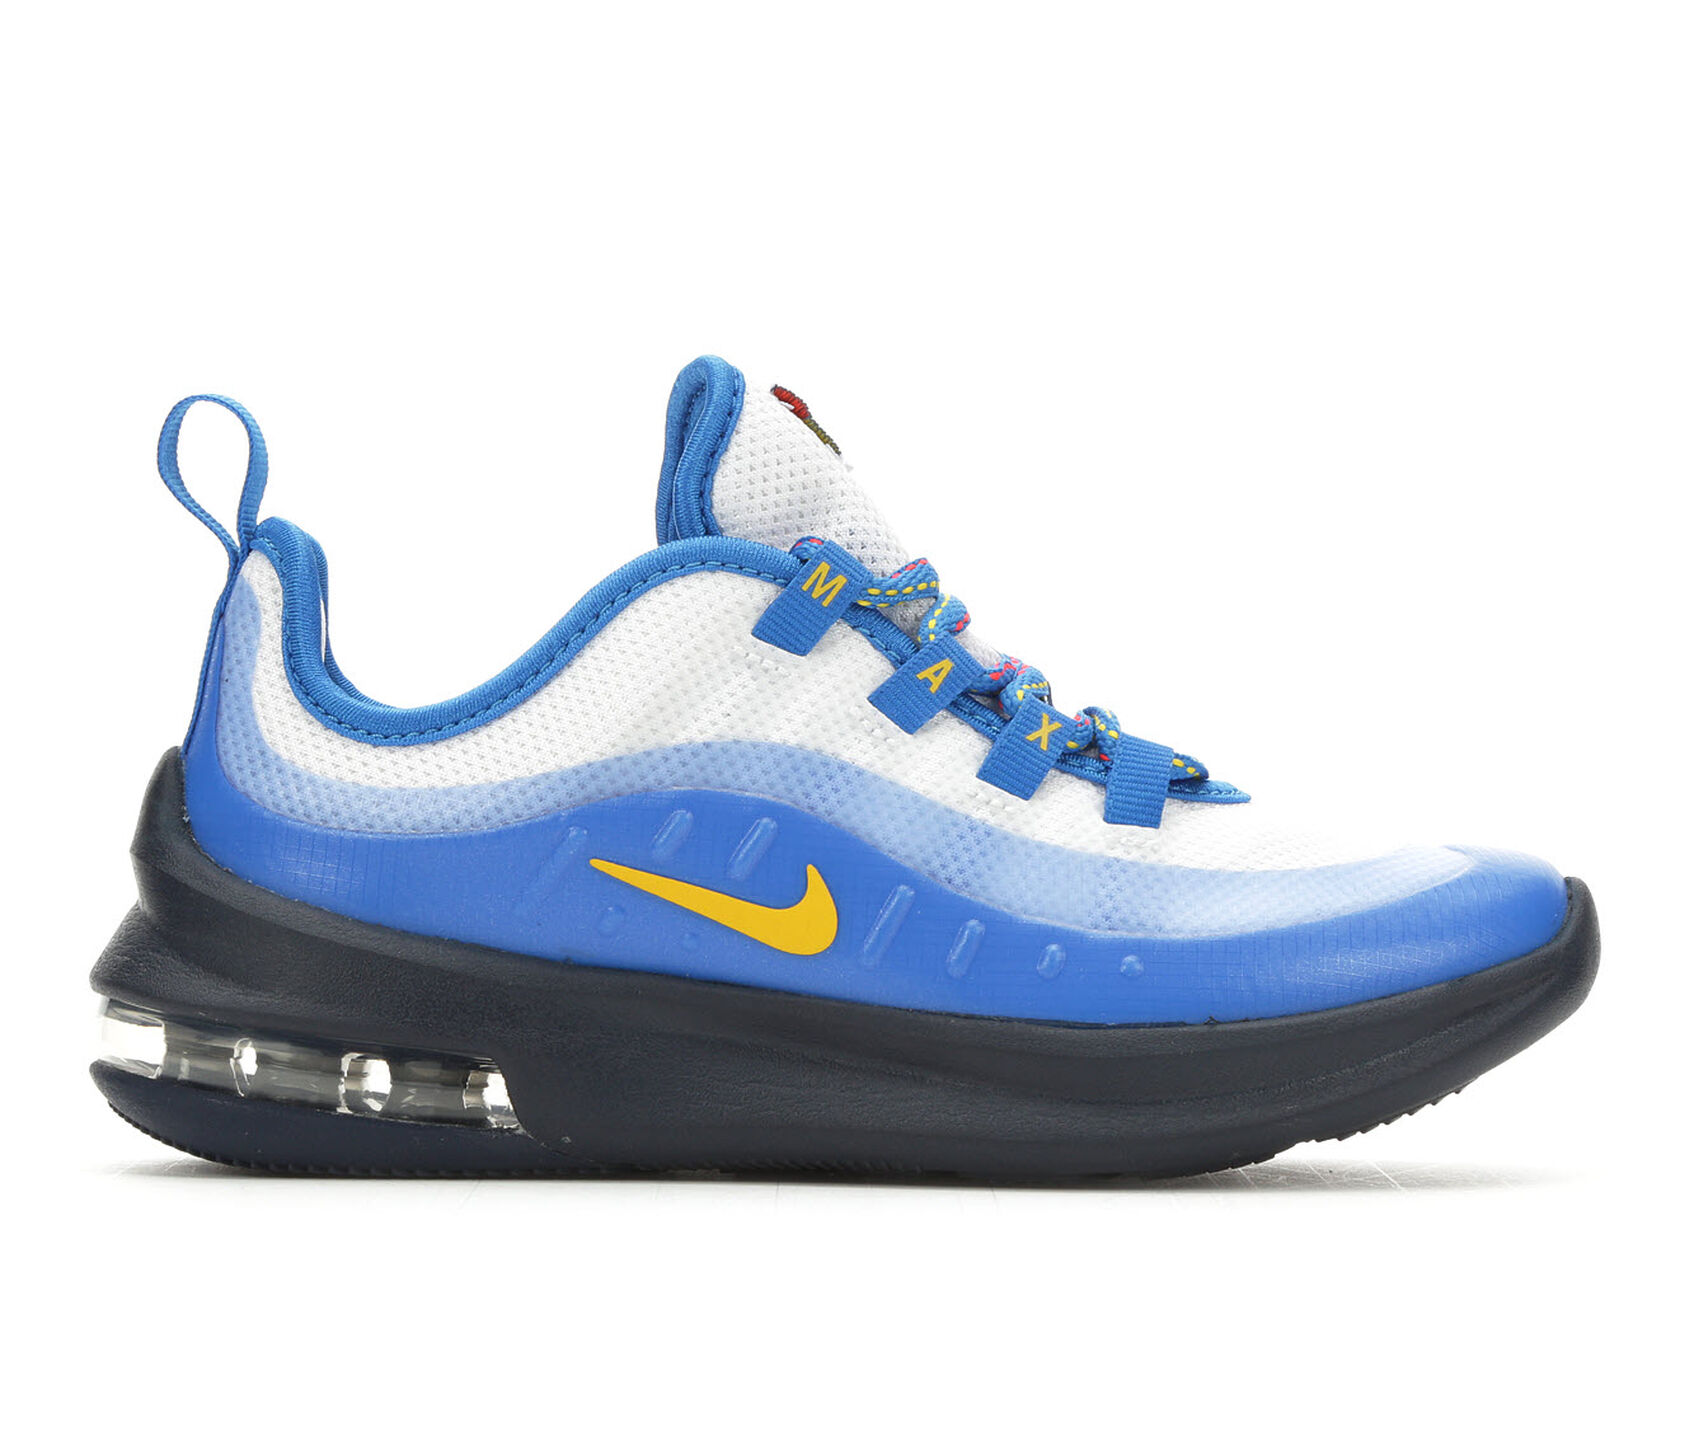 116e5828f7 Boys' Nike Little Kid Air Max Axis Running Shoes | Shoe Carnival